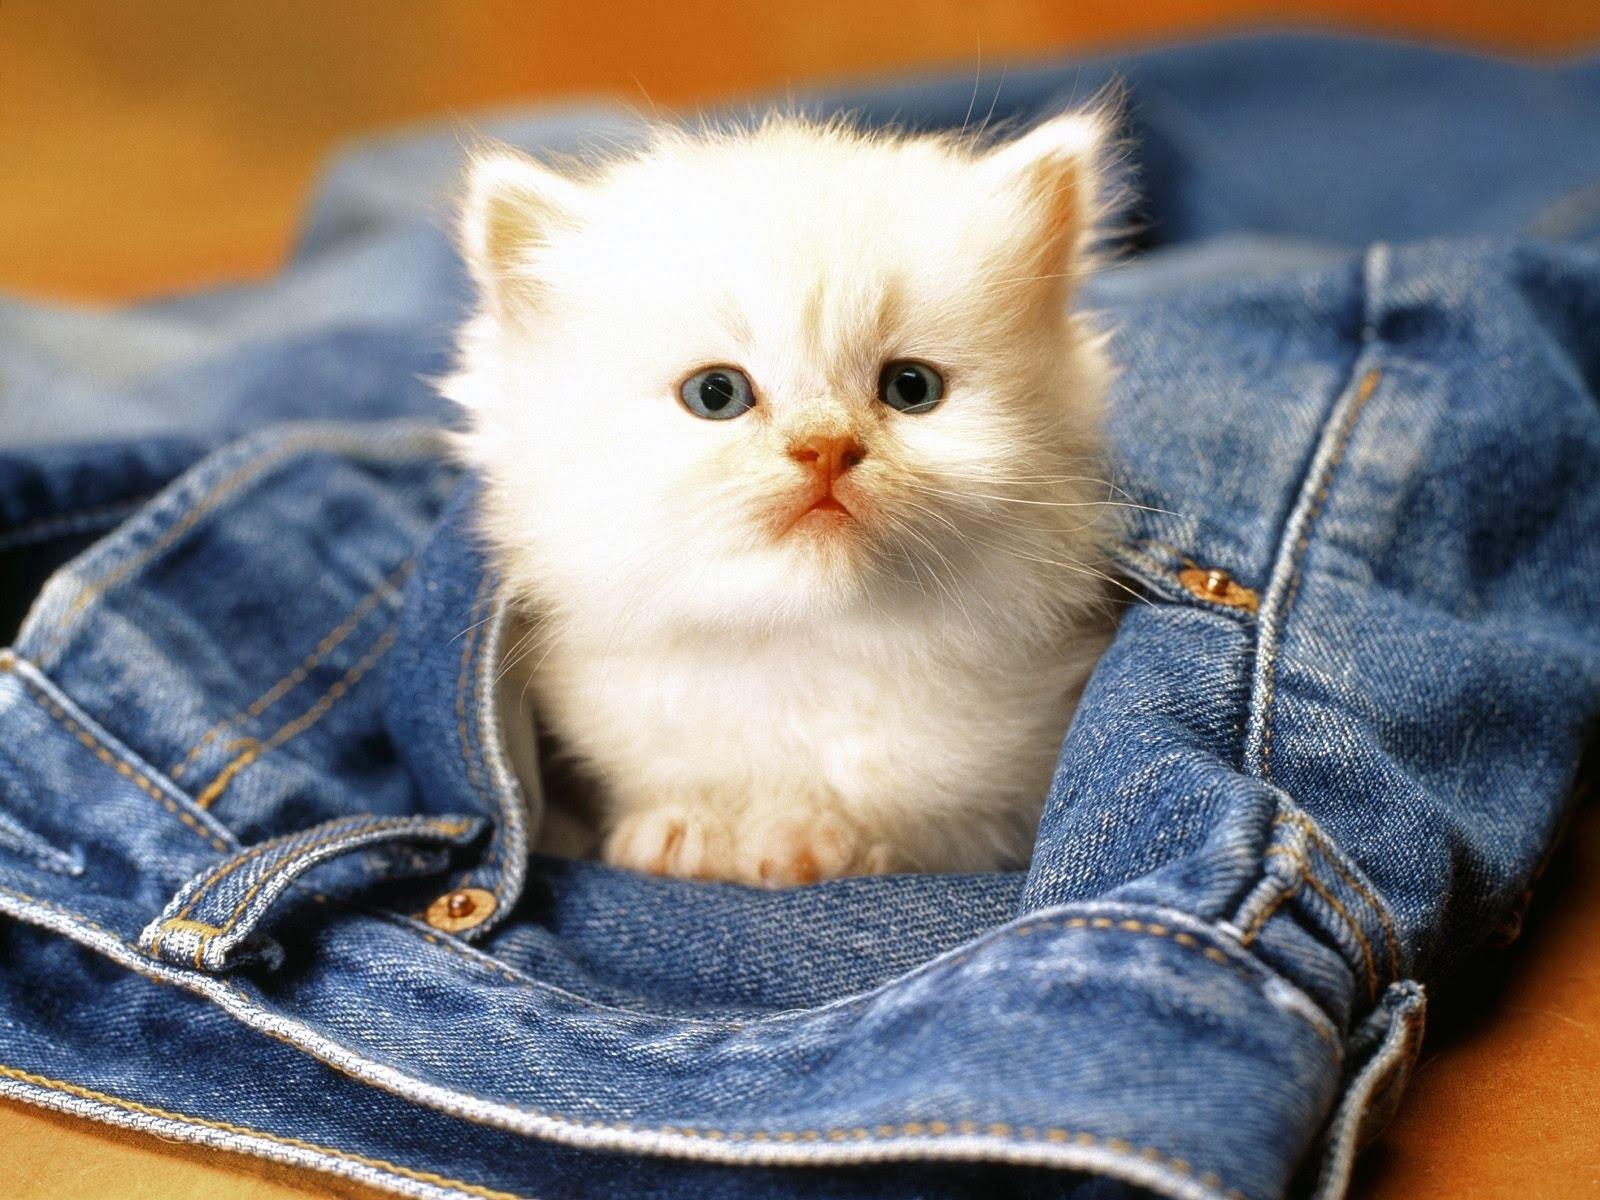 Pui de pisica Foto: fun.bzi.ro